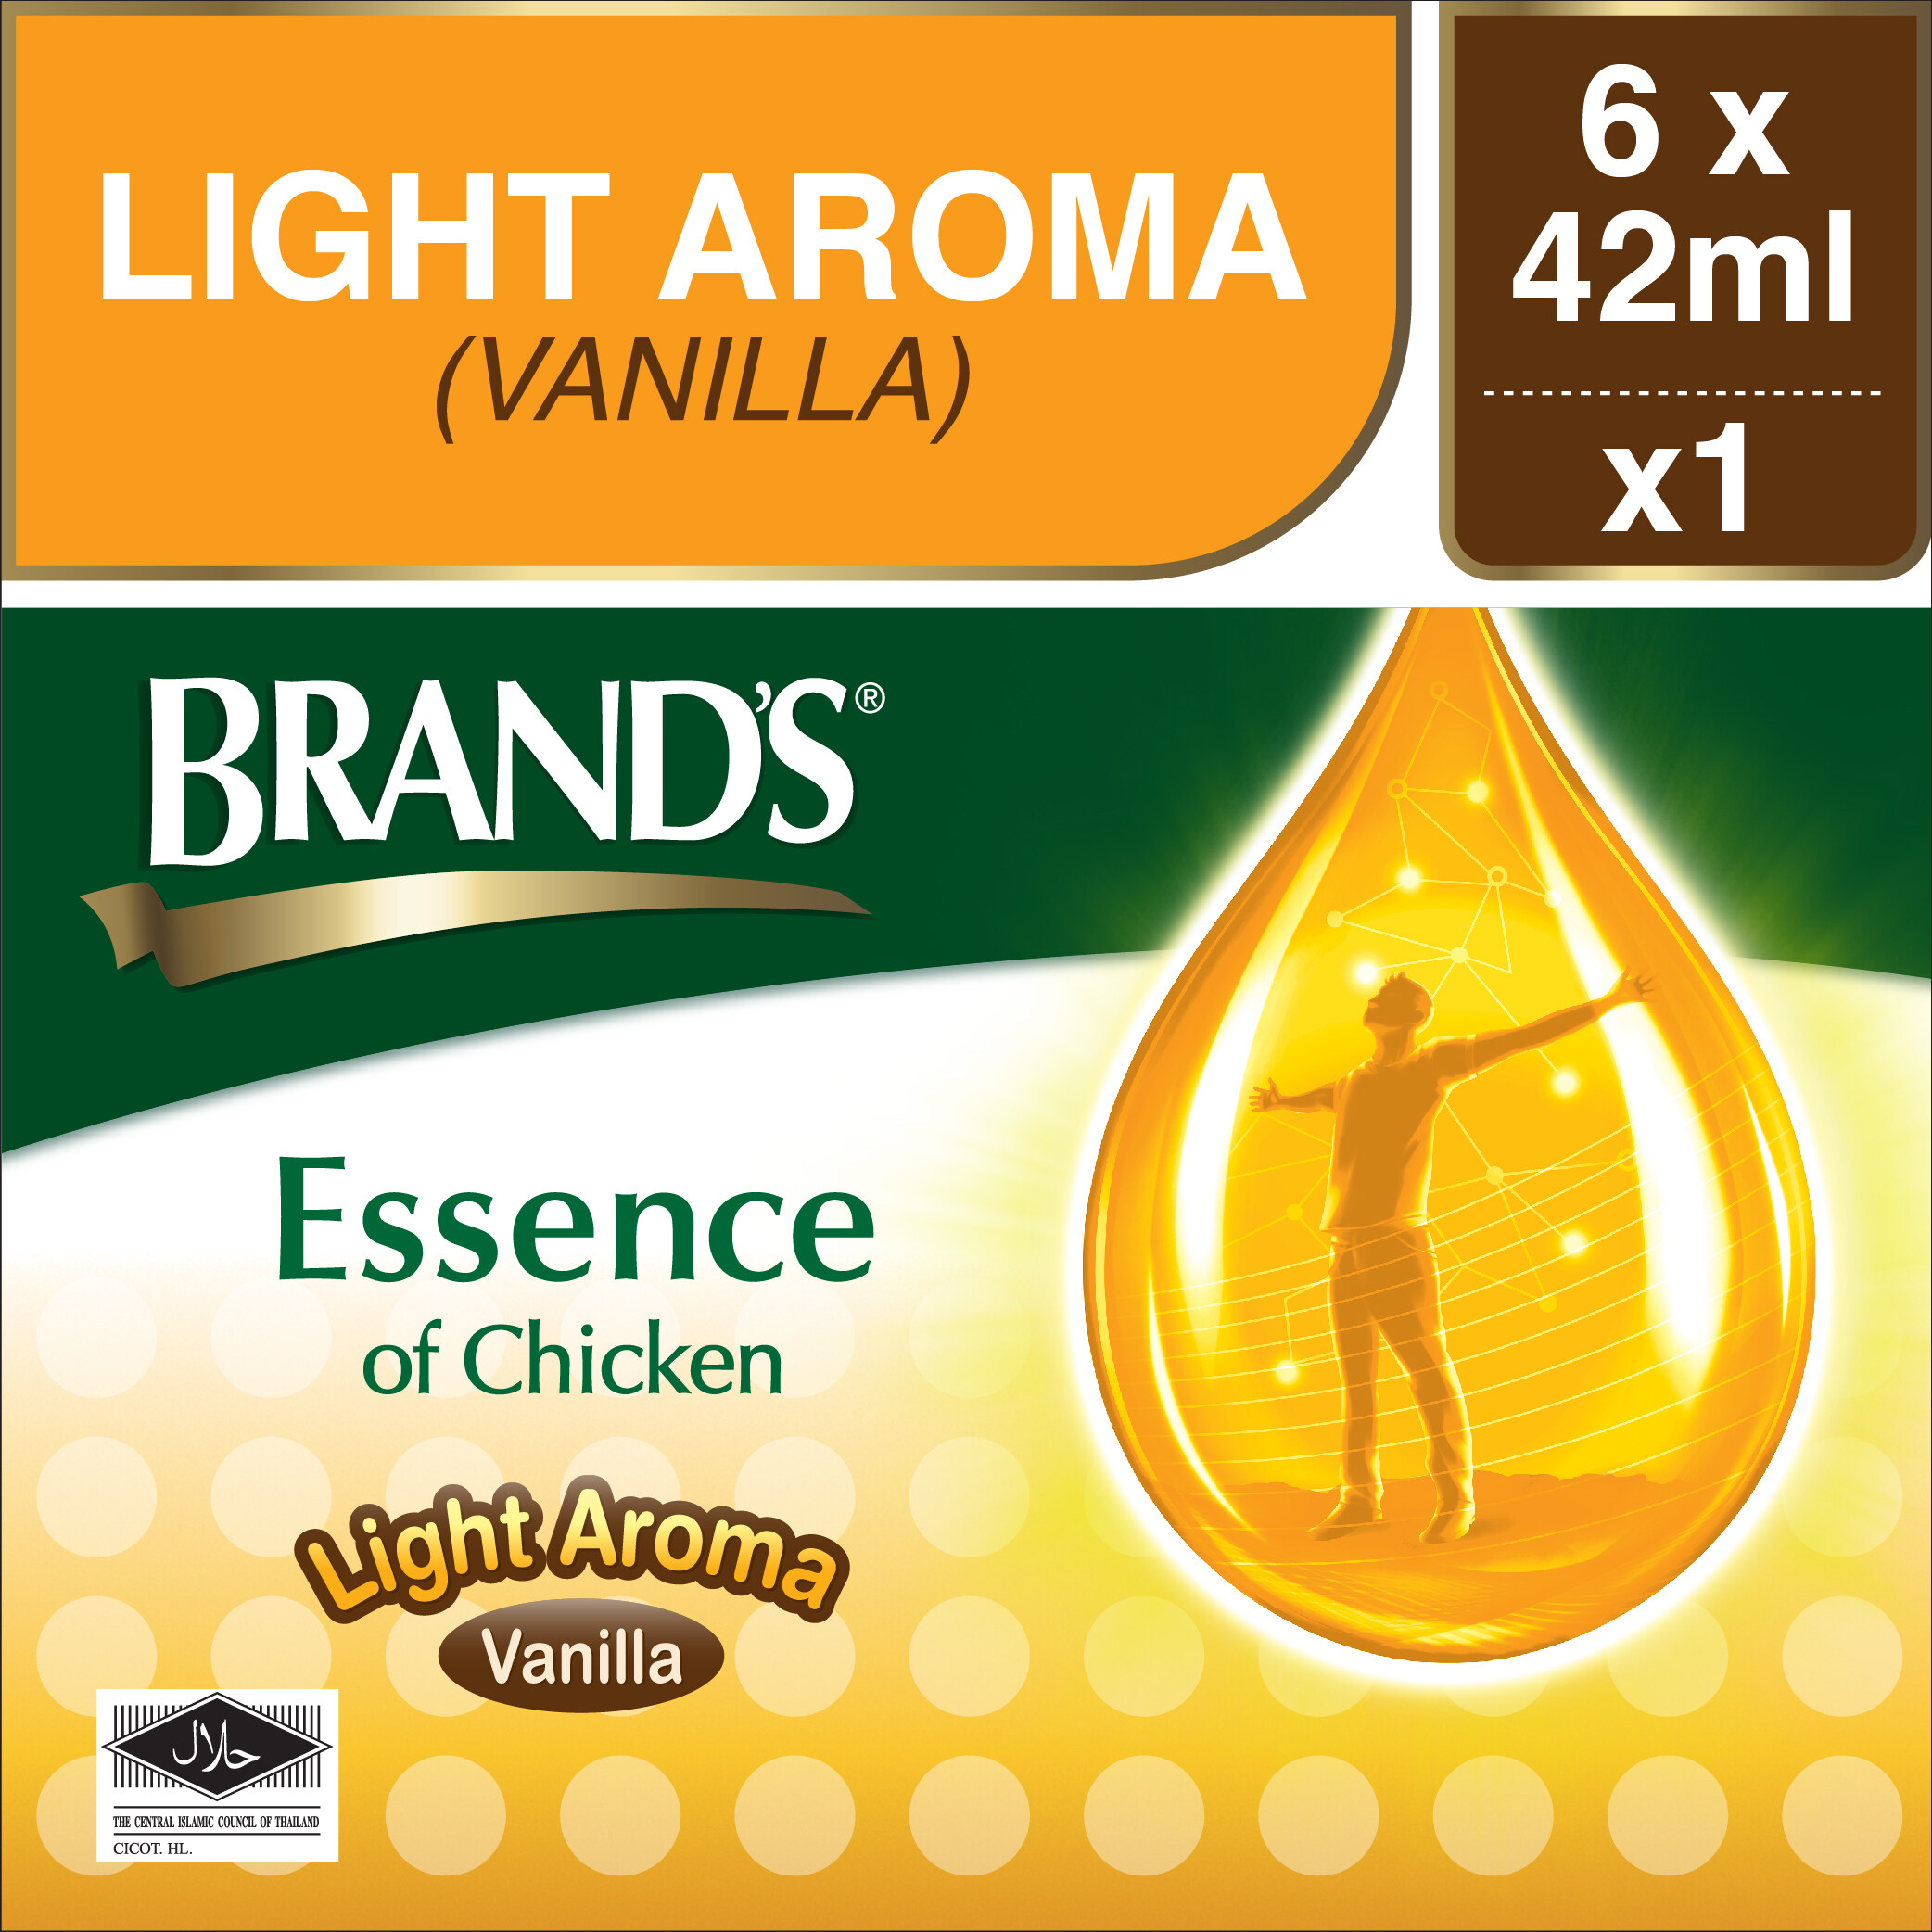 Brand's Essence of Chicken Light Aroma (6 bottles x 42ml)